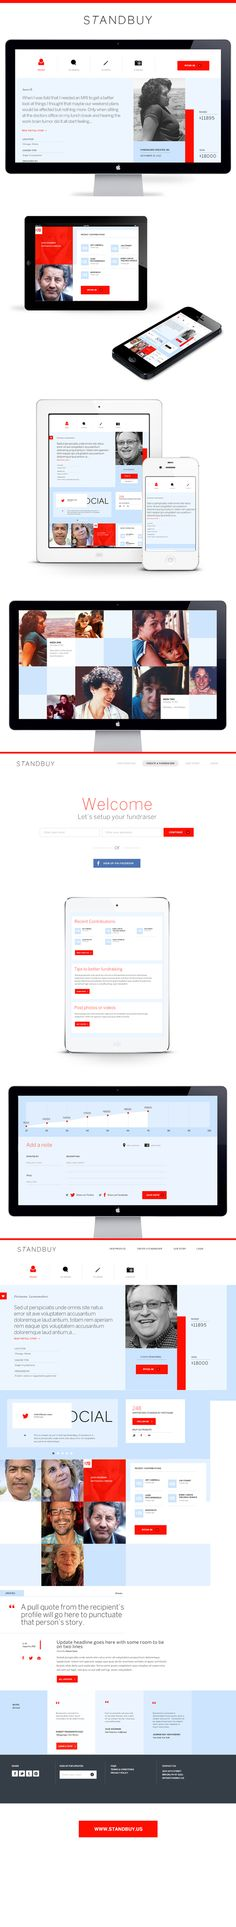 Standbuy.us by Moosesyrup, via #Behance #Webdesign #Mobile